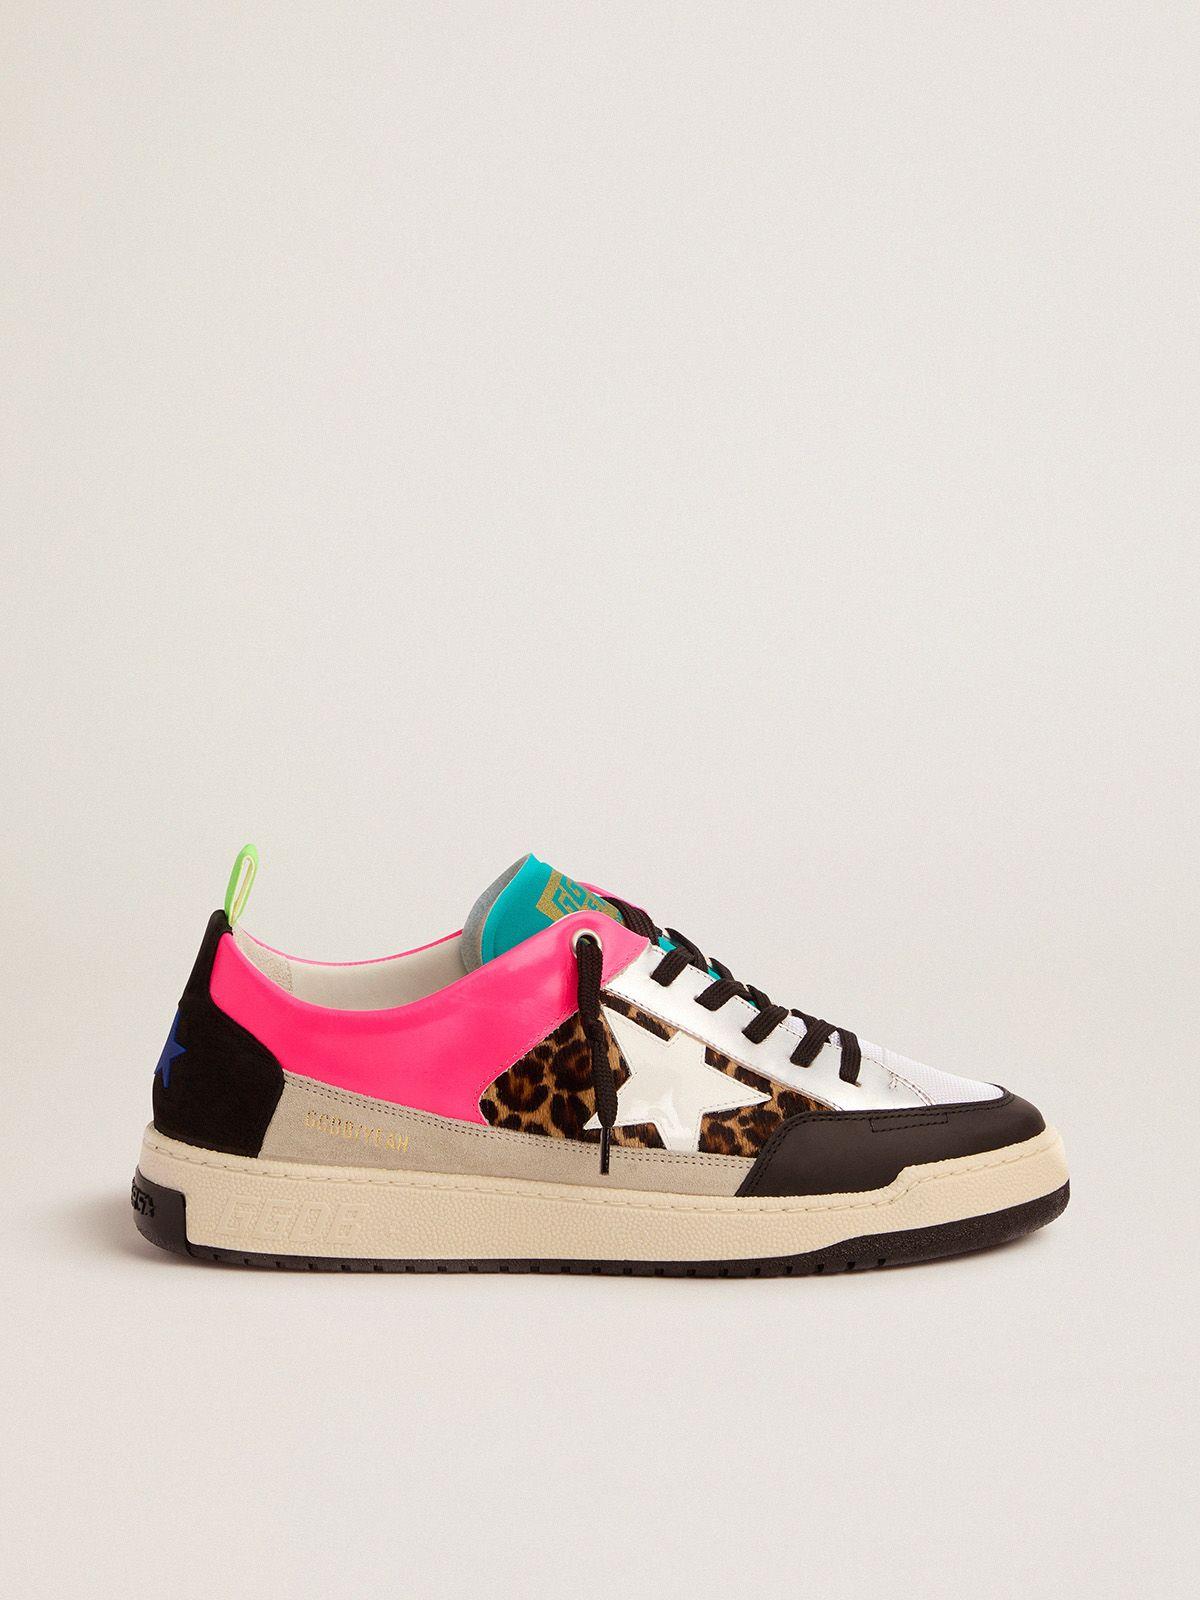 Men's fuchsia and leopard-print Yeah sneakers